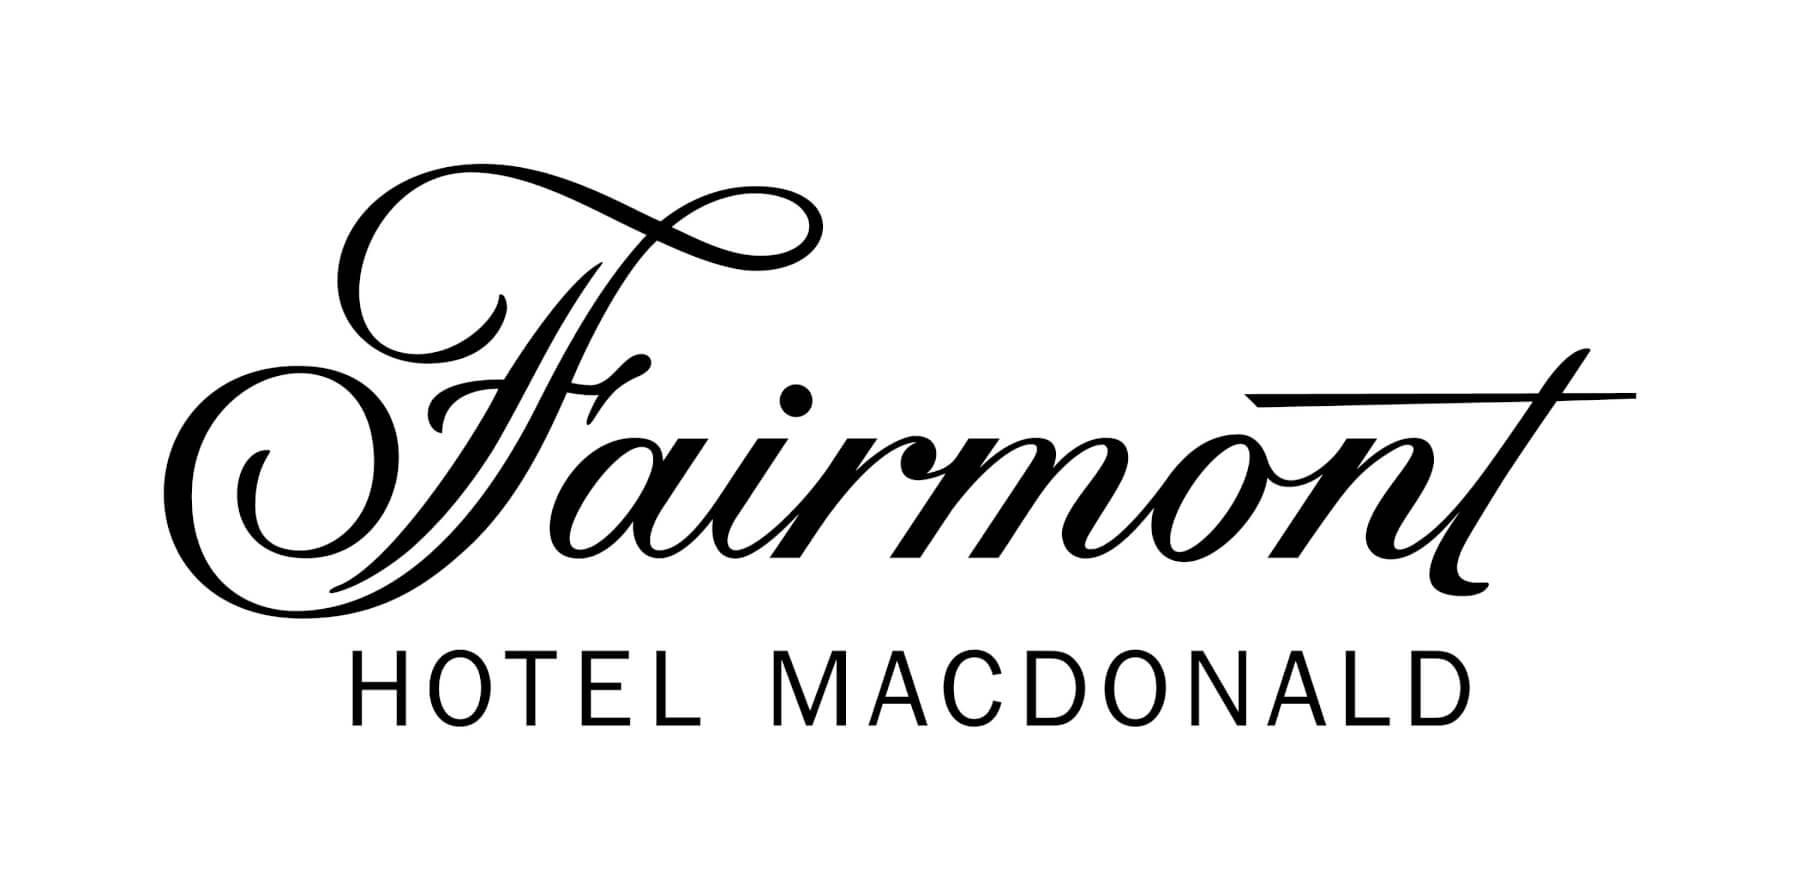 Fairmont Macdonald Hotel